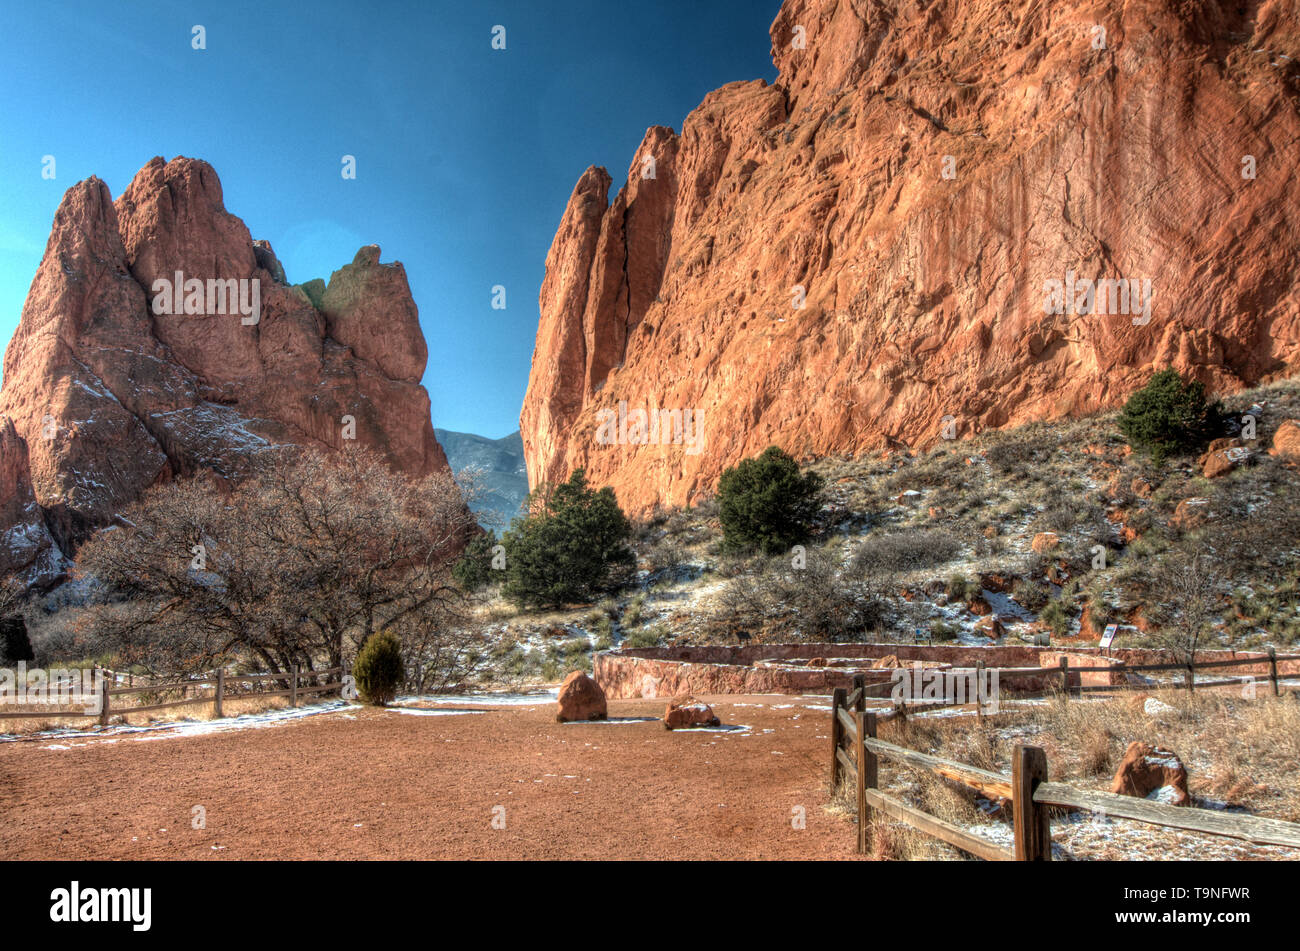 Garden of the Gods park in Colorado Springs, Colorado - Stock Image